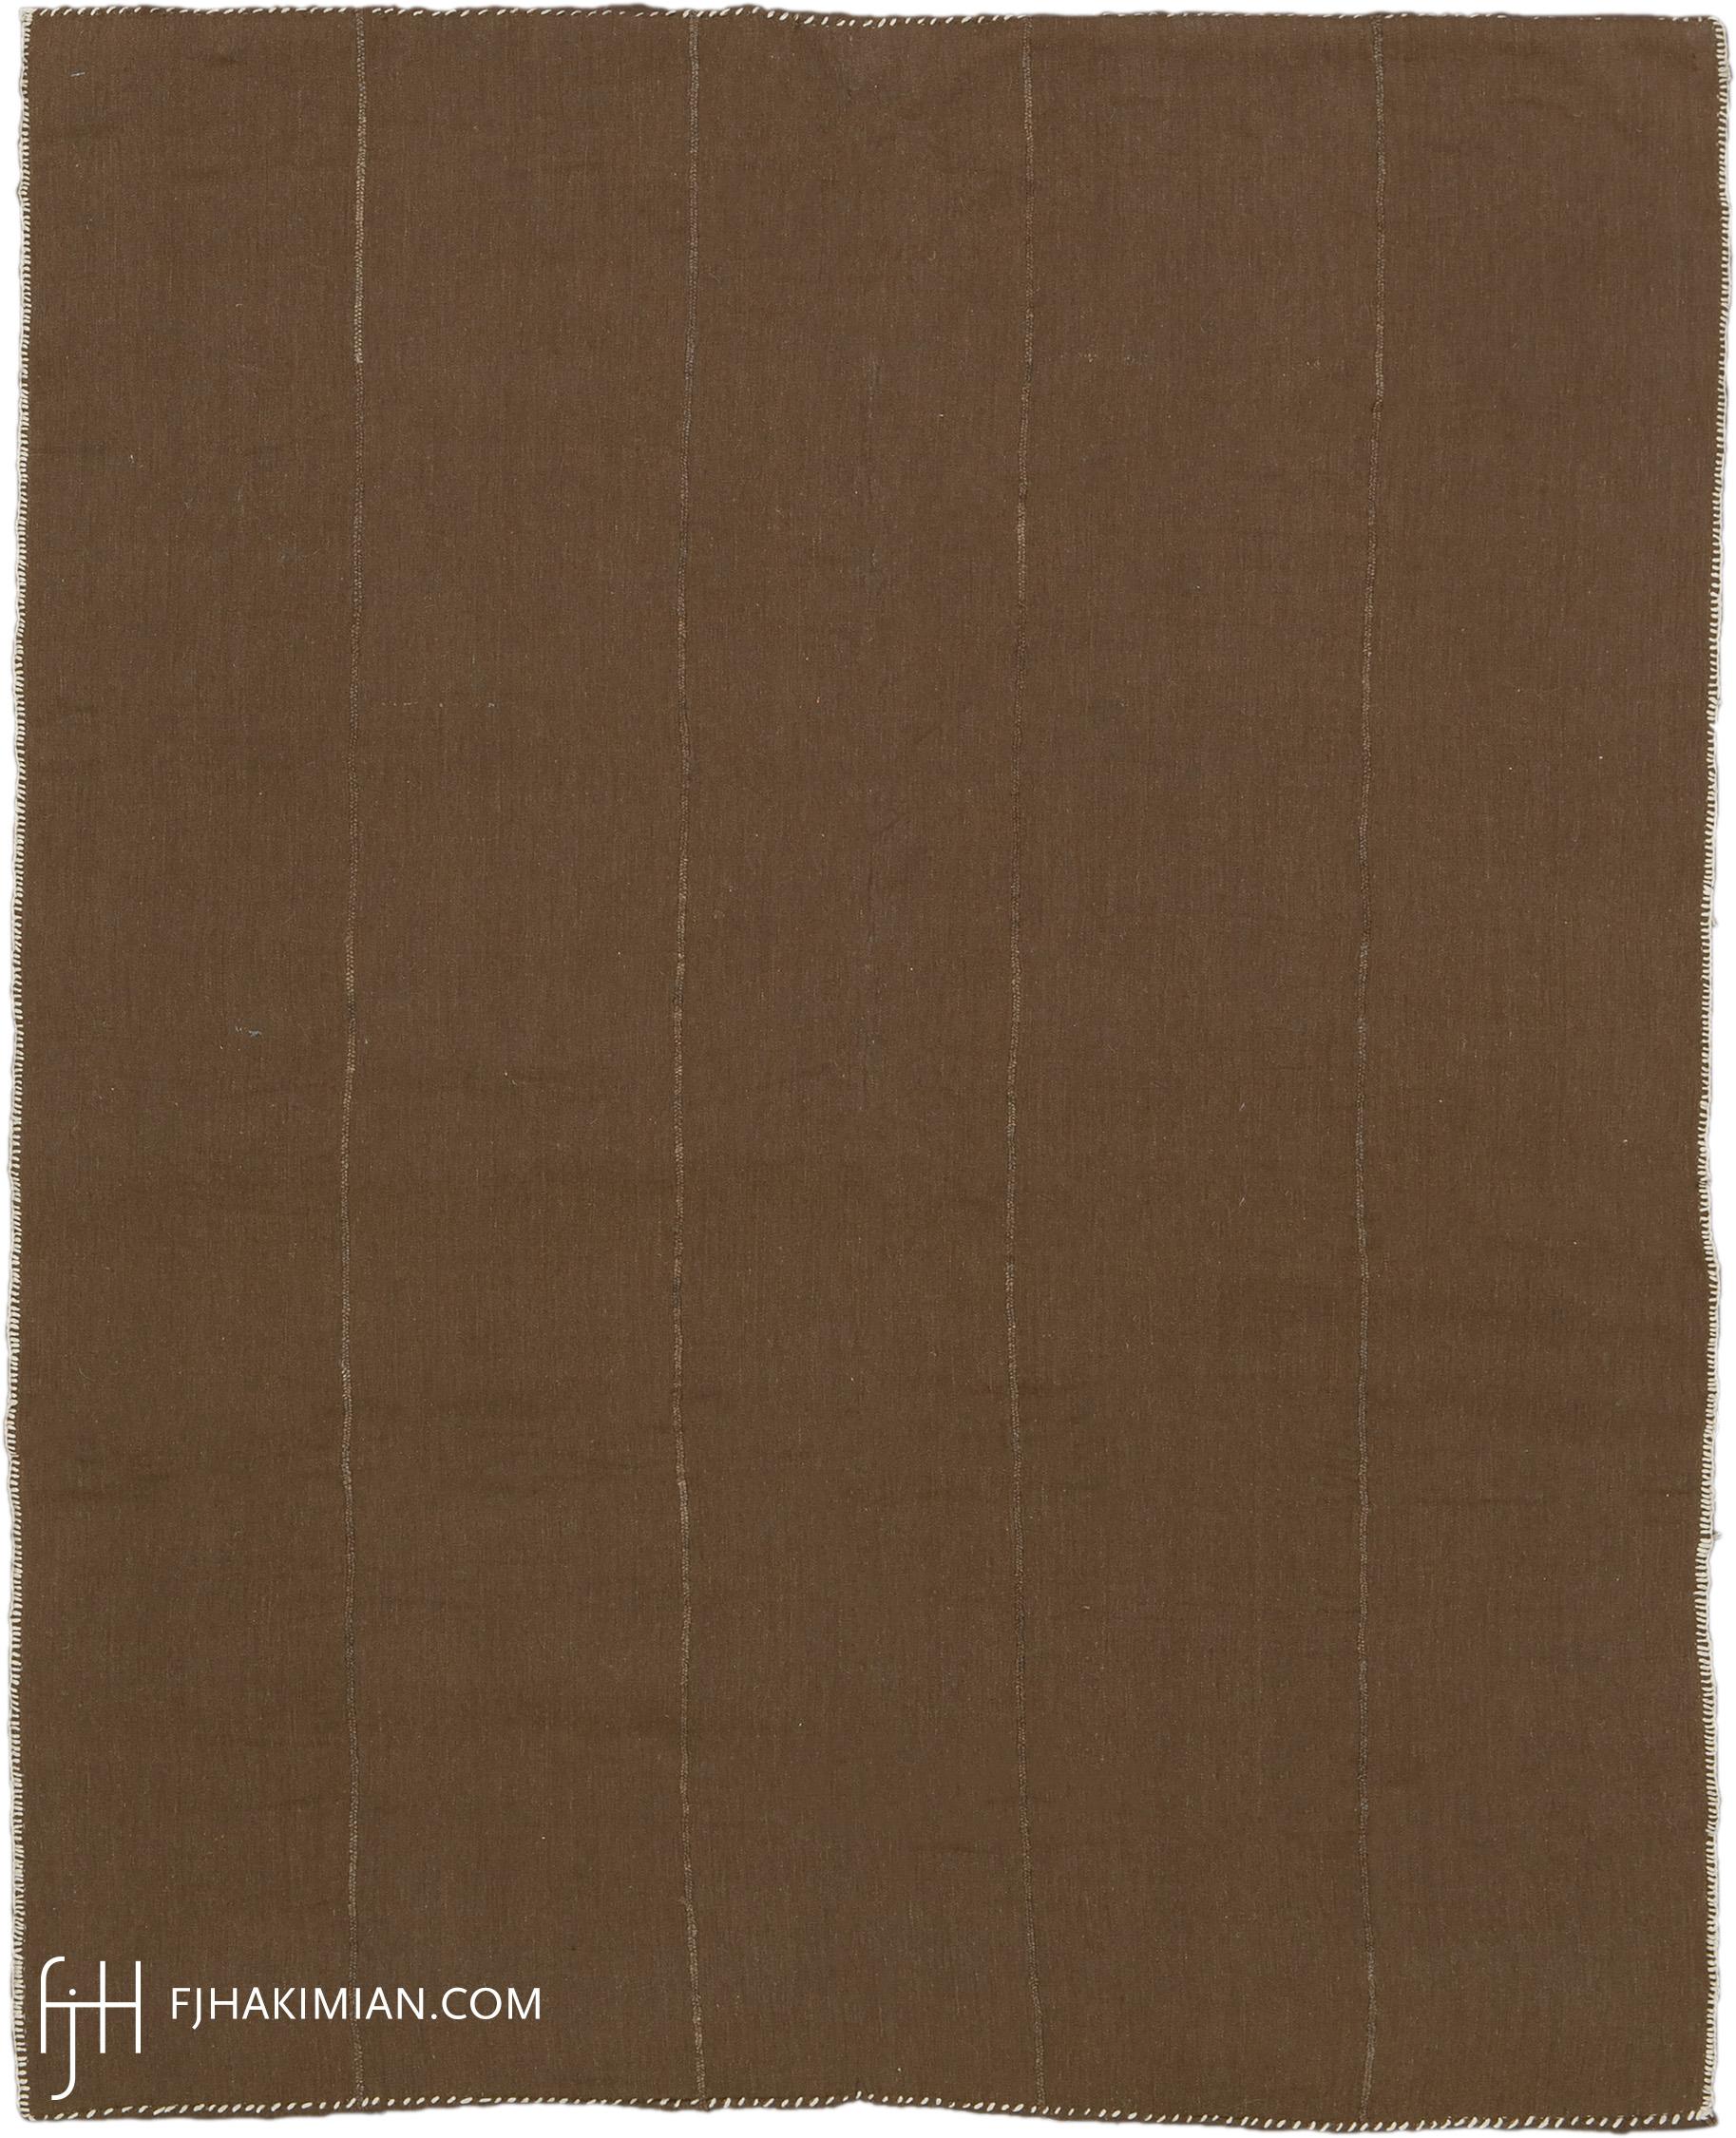 Vintage Kilim Composition #23033   FJ Hakimian